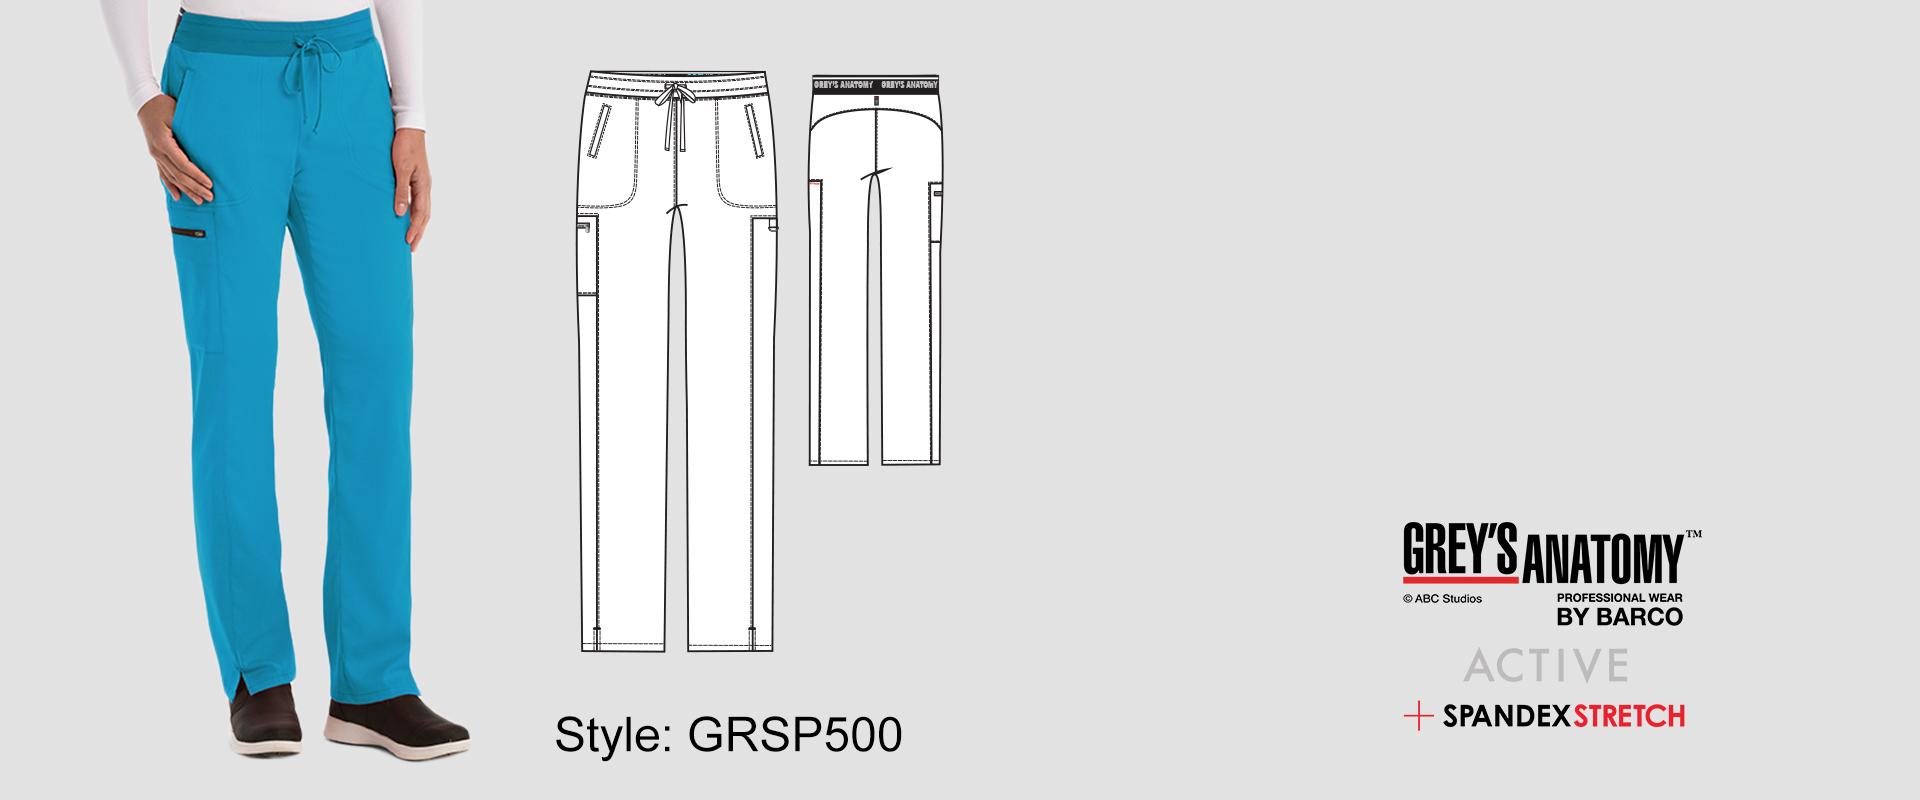 (GRSP500) Scrub Pants